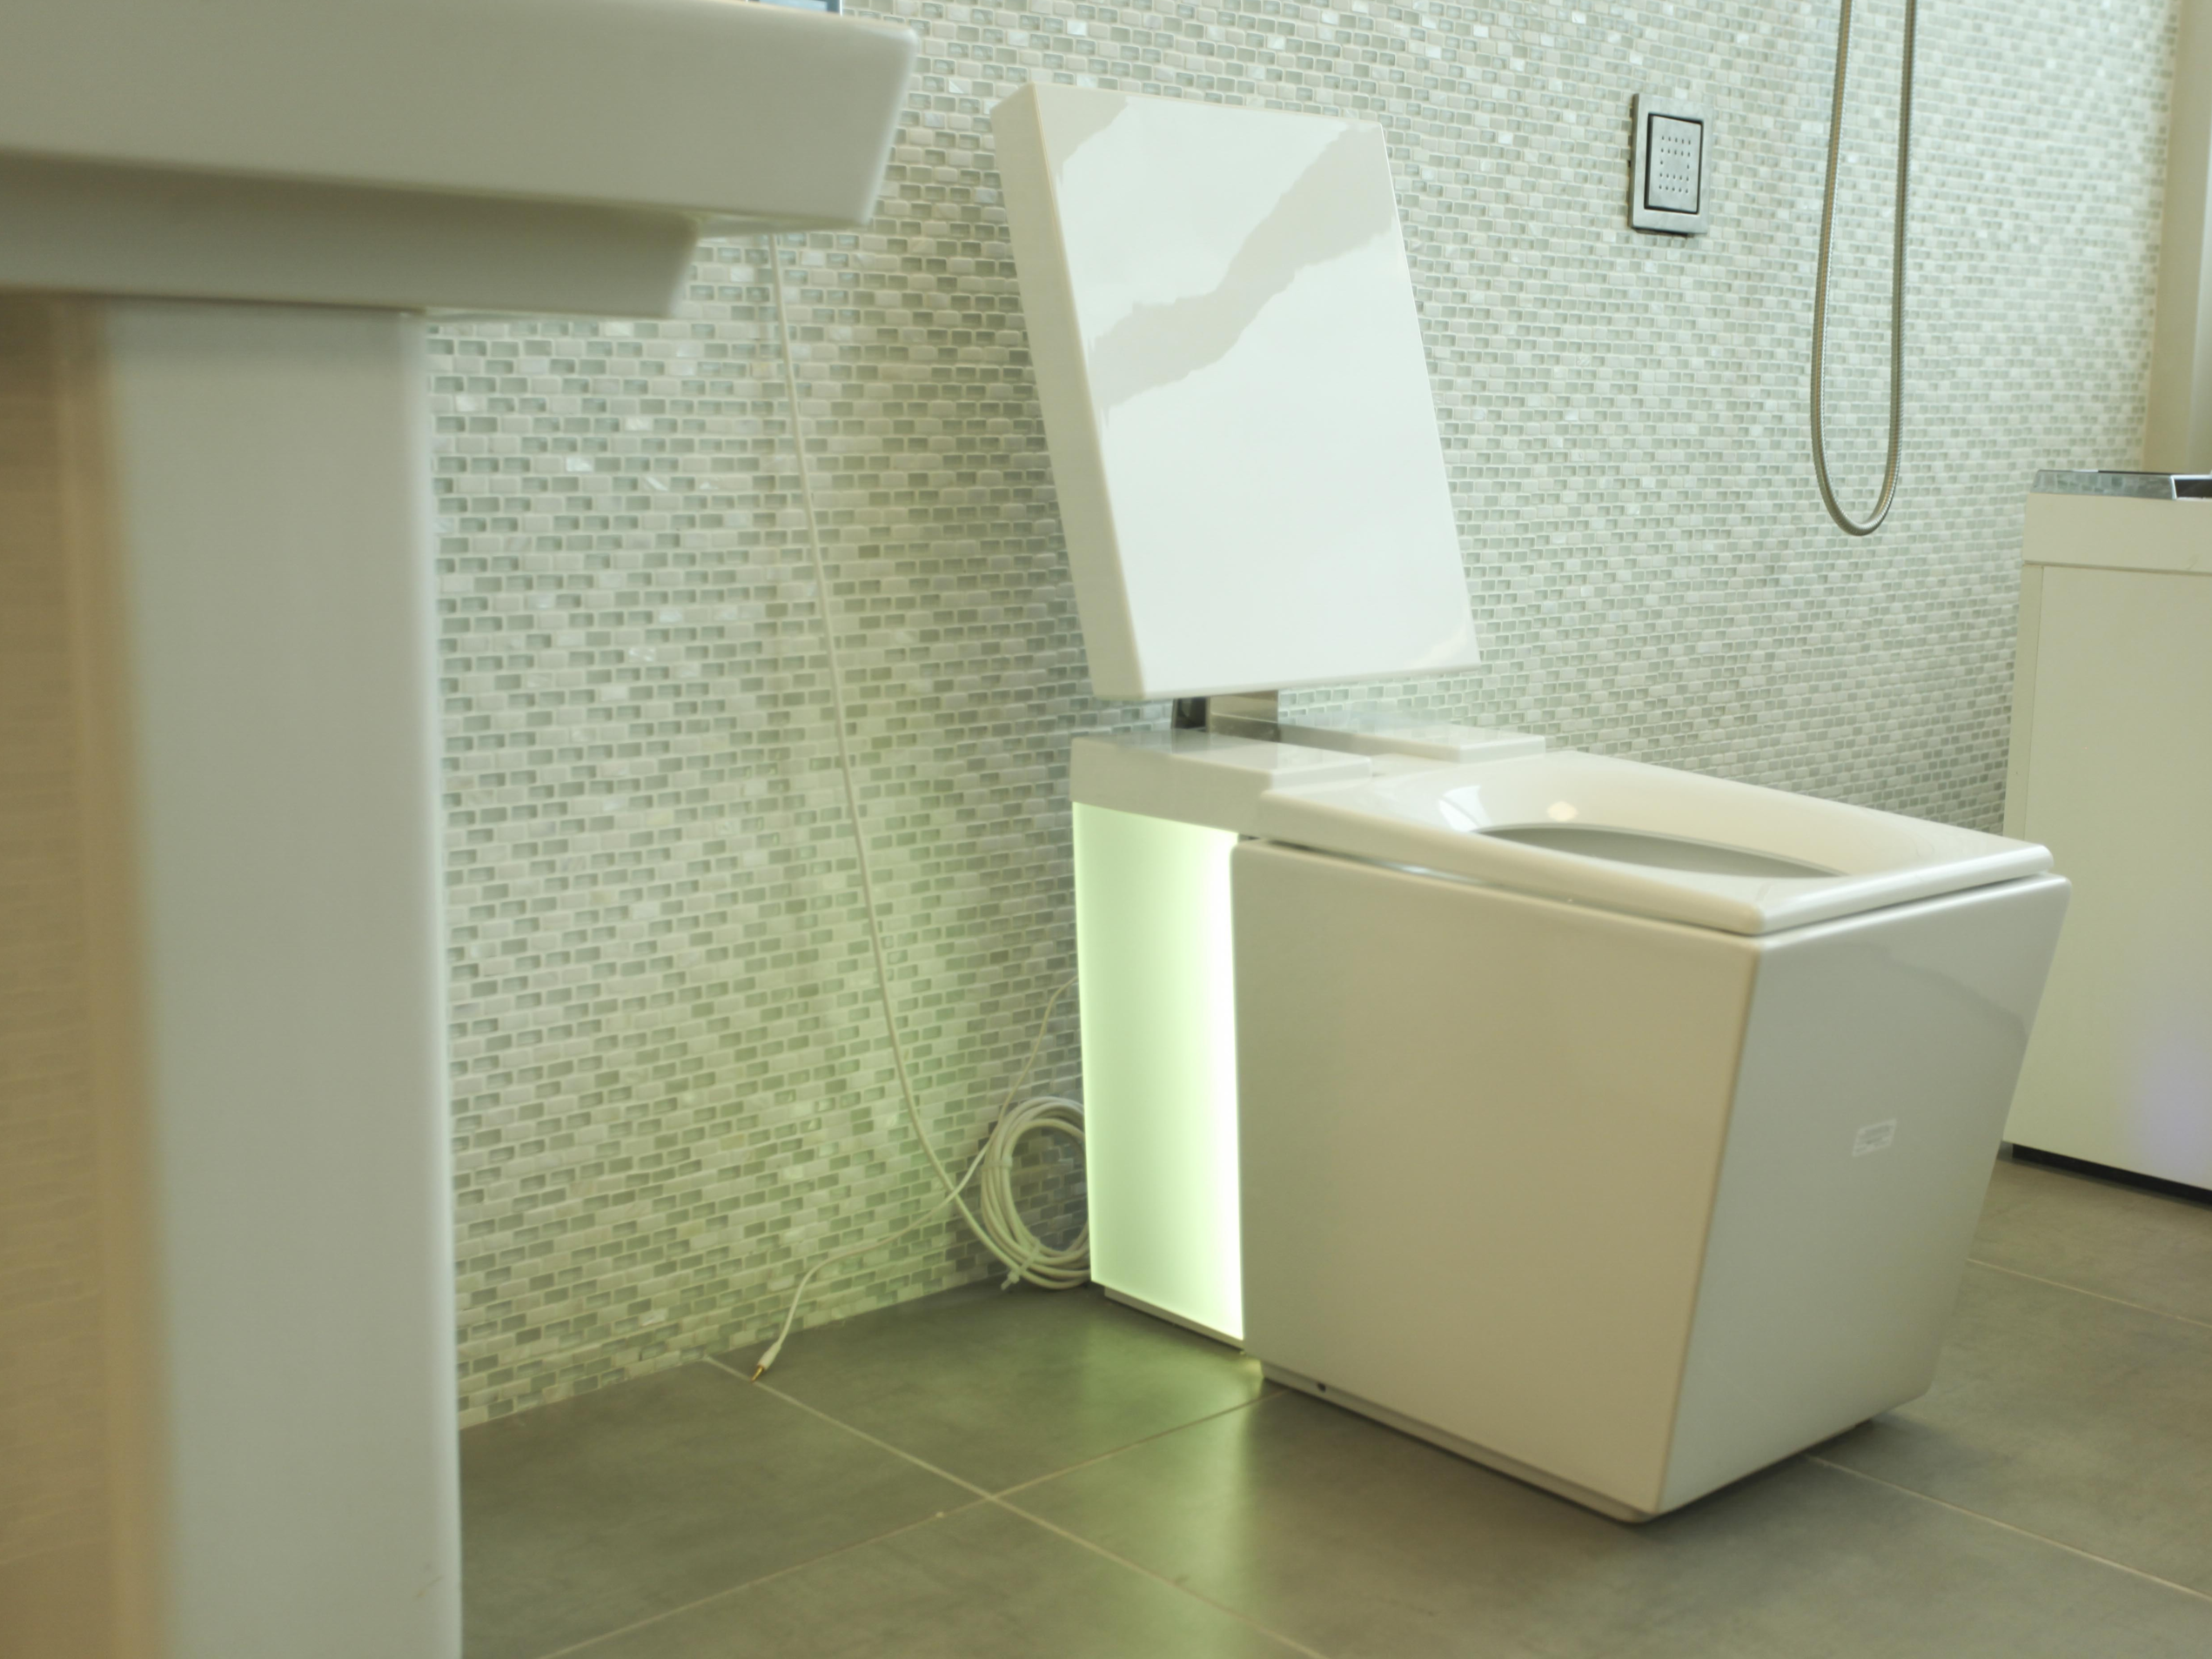 KOHLER Kitchen & Bathroom Products at Atlantis Bath Centre in ...